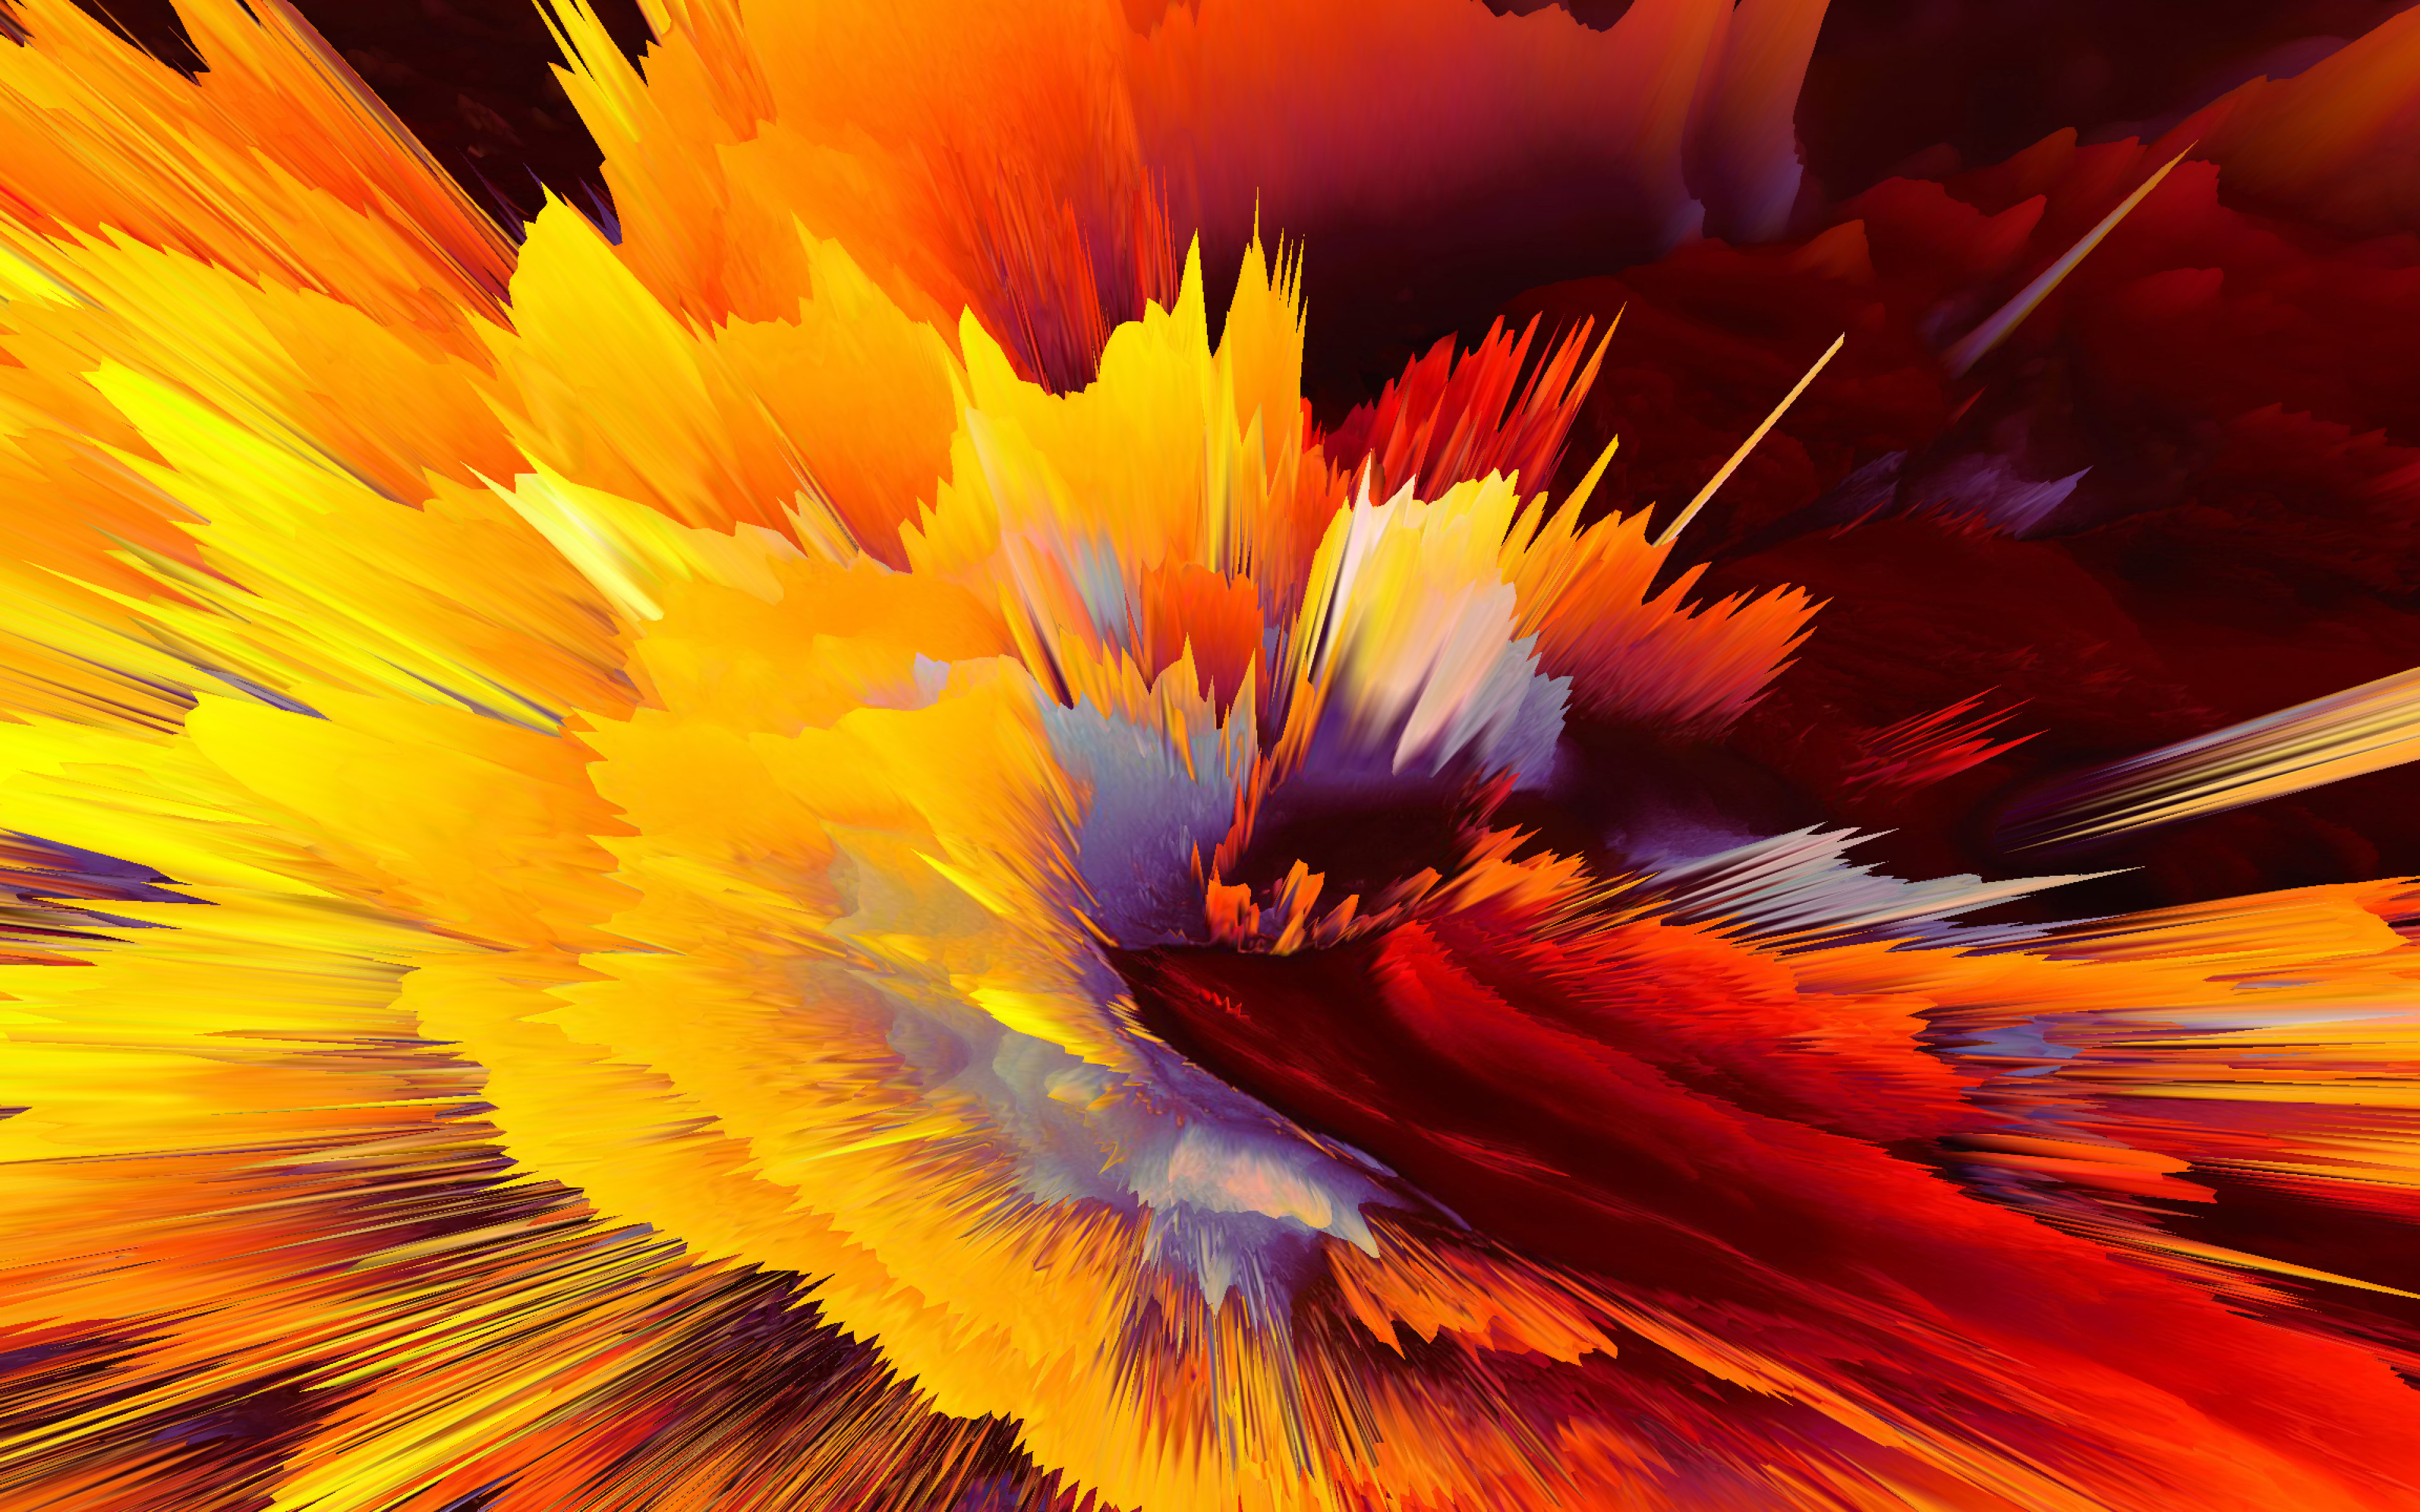 Fondos de pantalla Explosión de colores abstracta